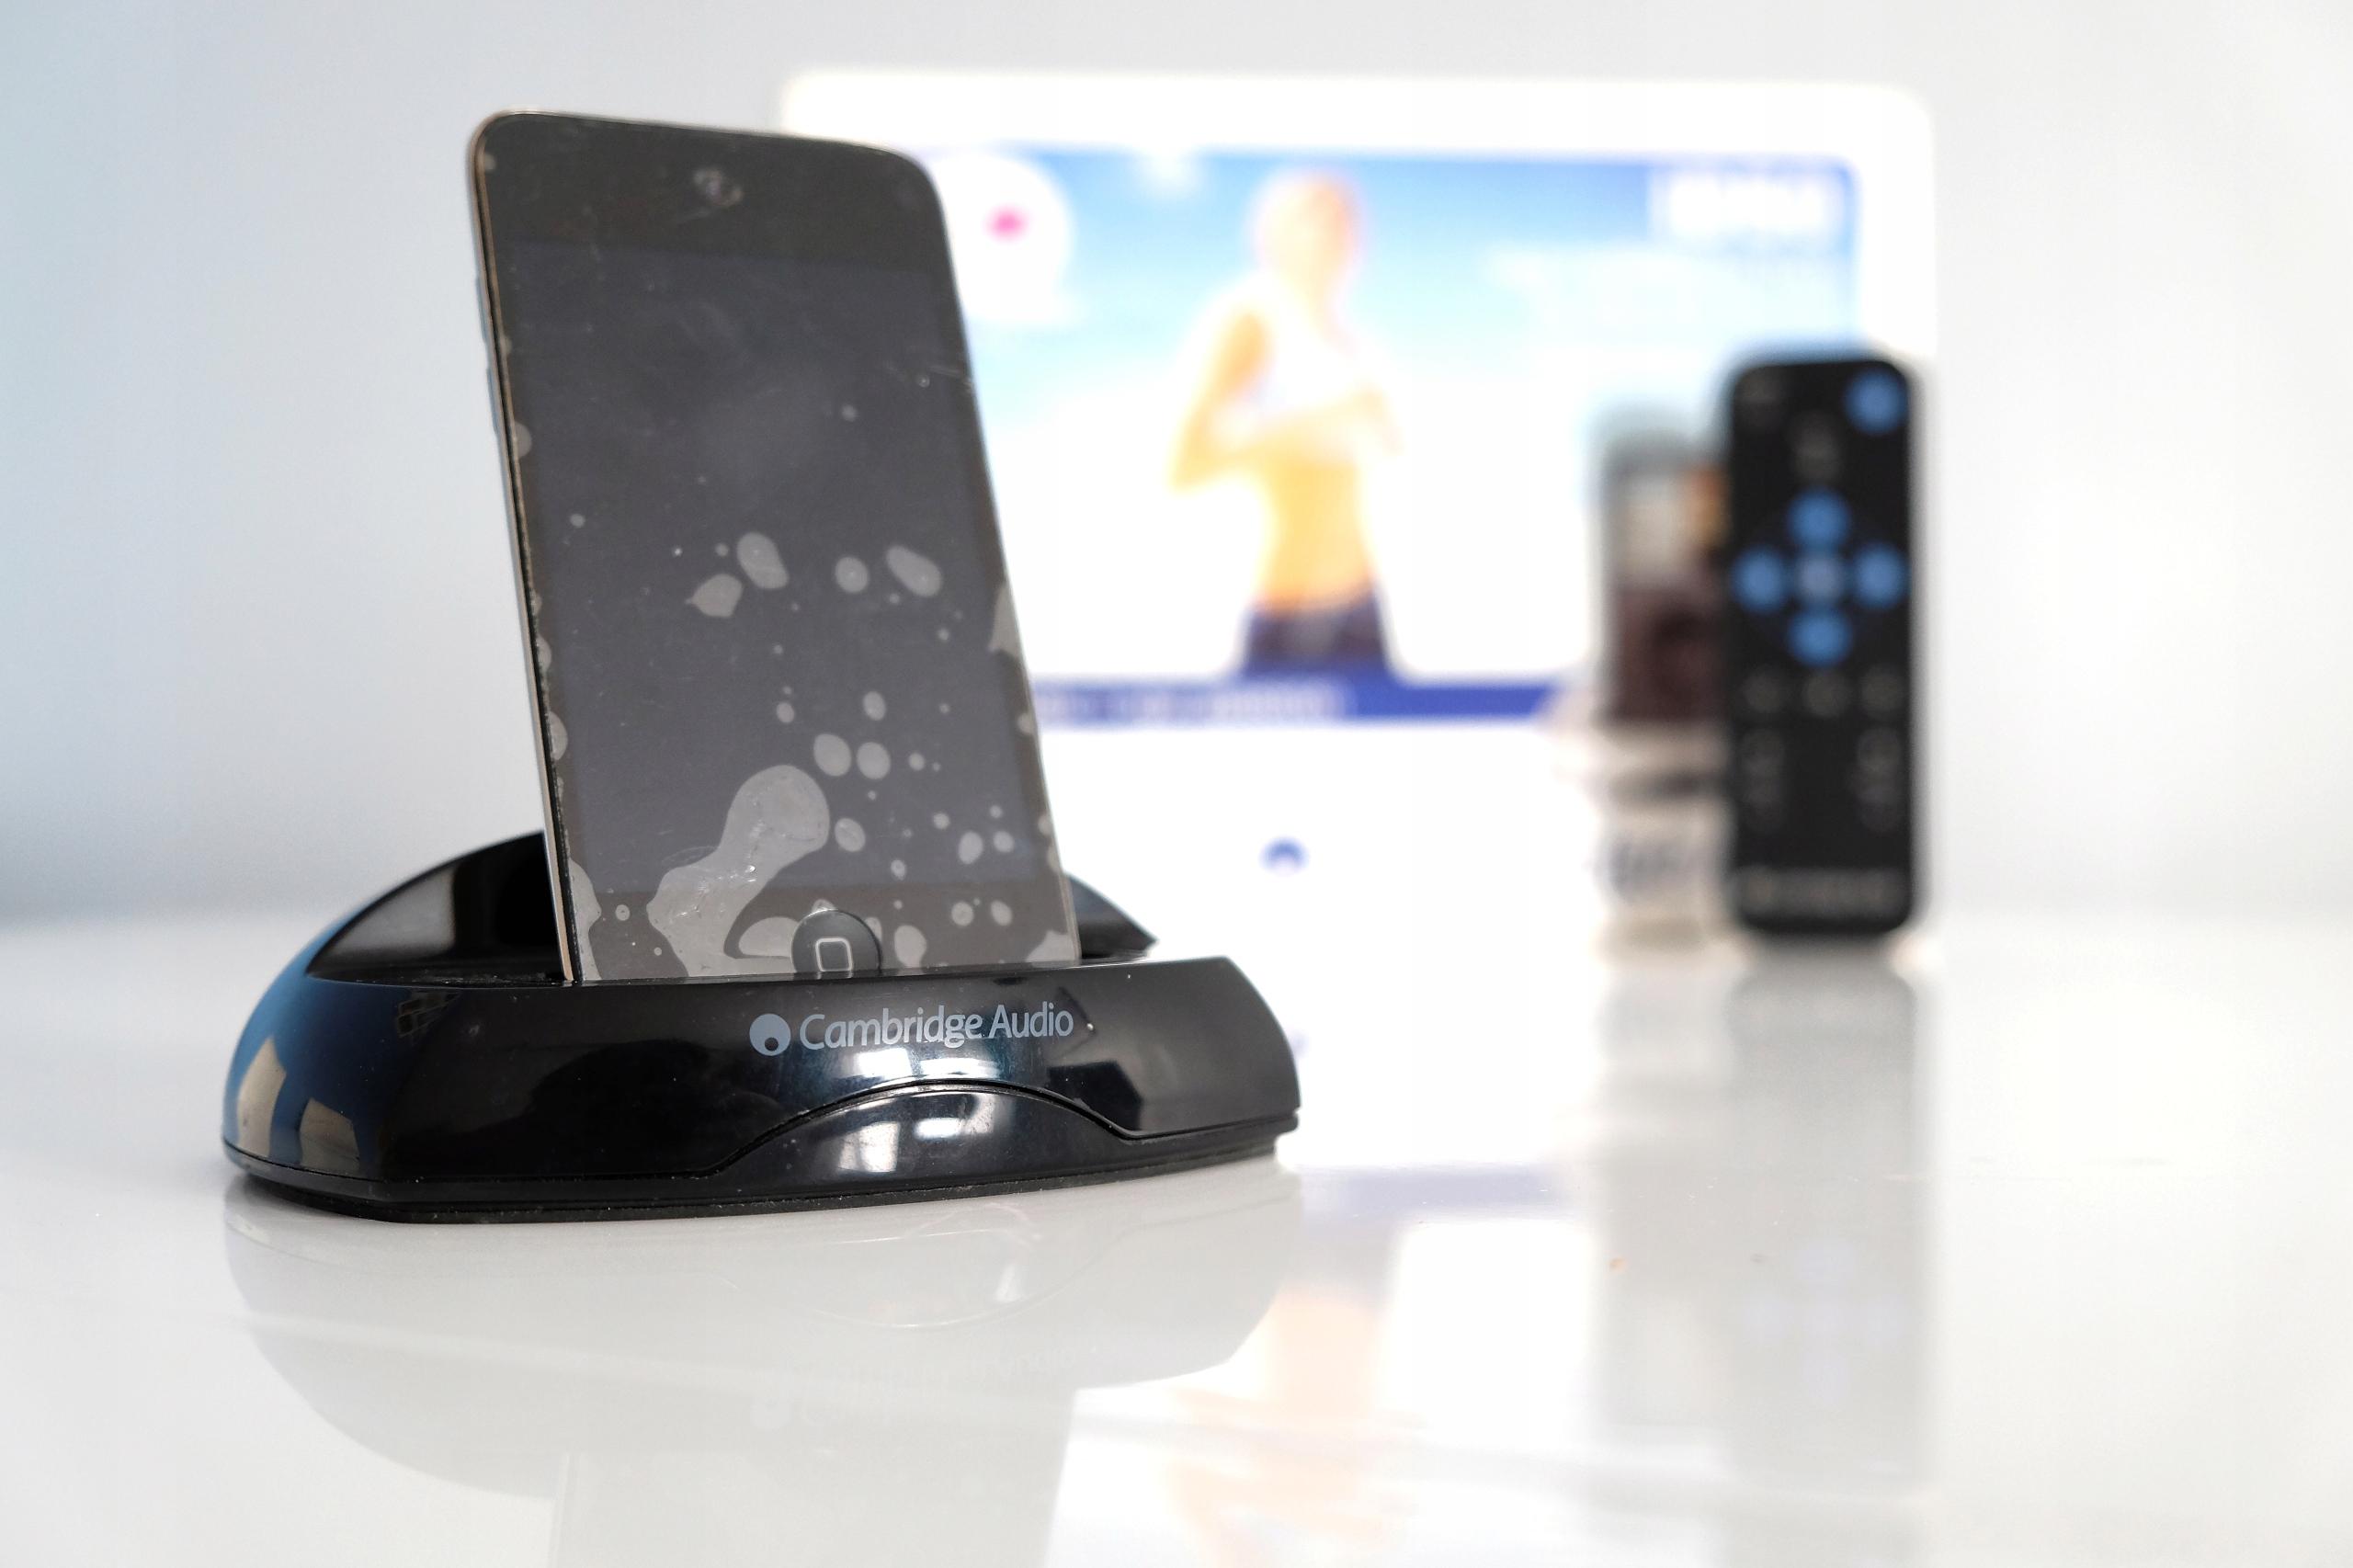 Cambridge audio id-50 + iPod Touch 4g 8 GB